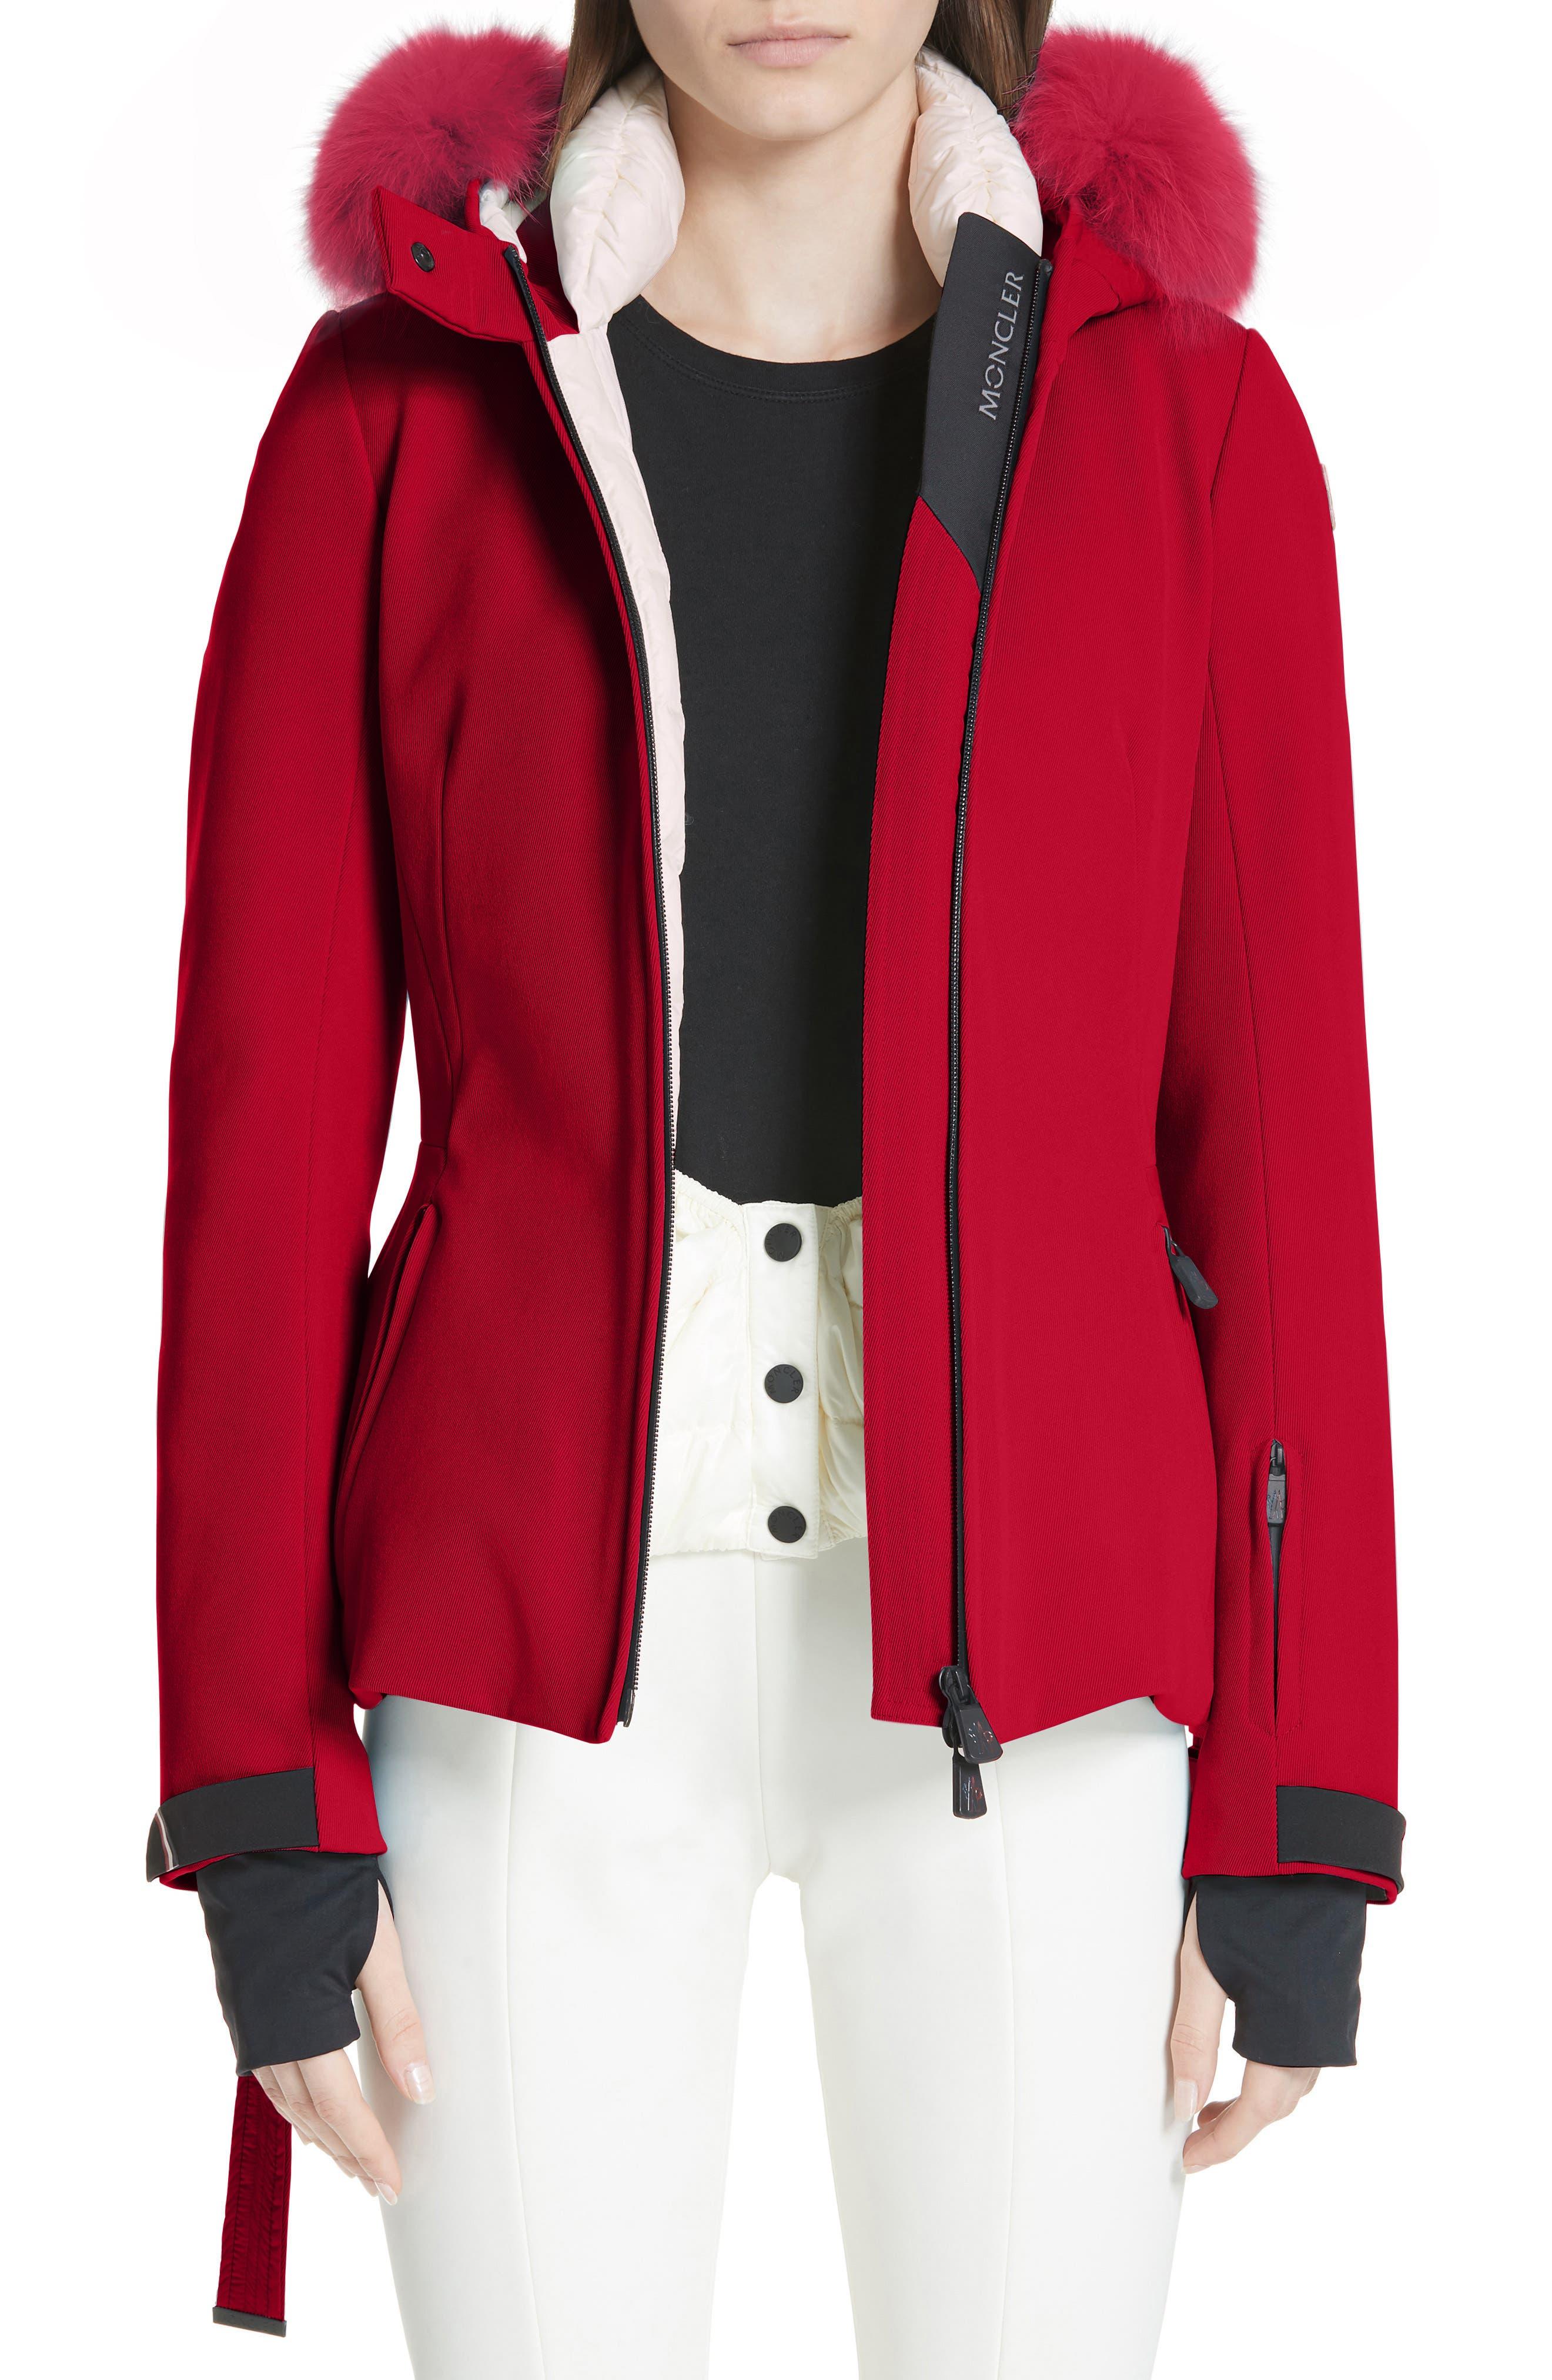 MONCLER, Bauges Water Repellent Hooded Down Coat with Detachable Genuine Fox Fur Trim, Main thumbnail 1, color, RED